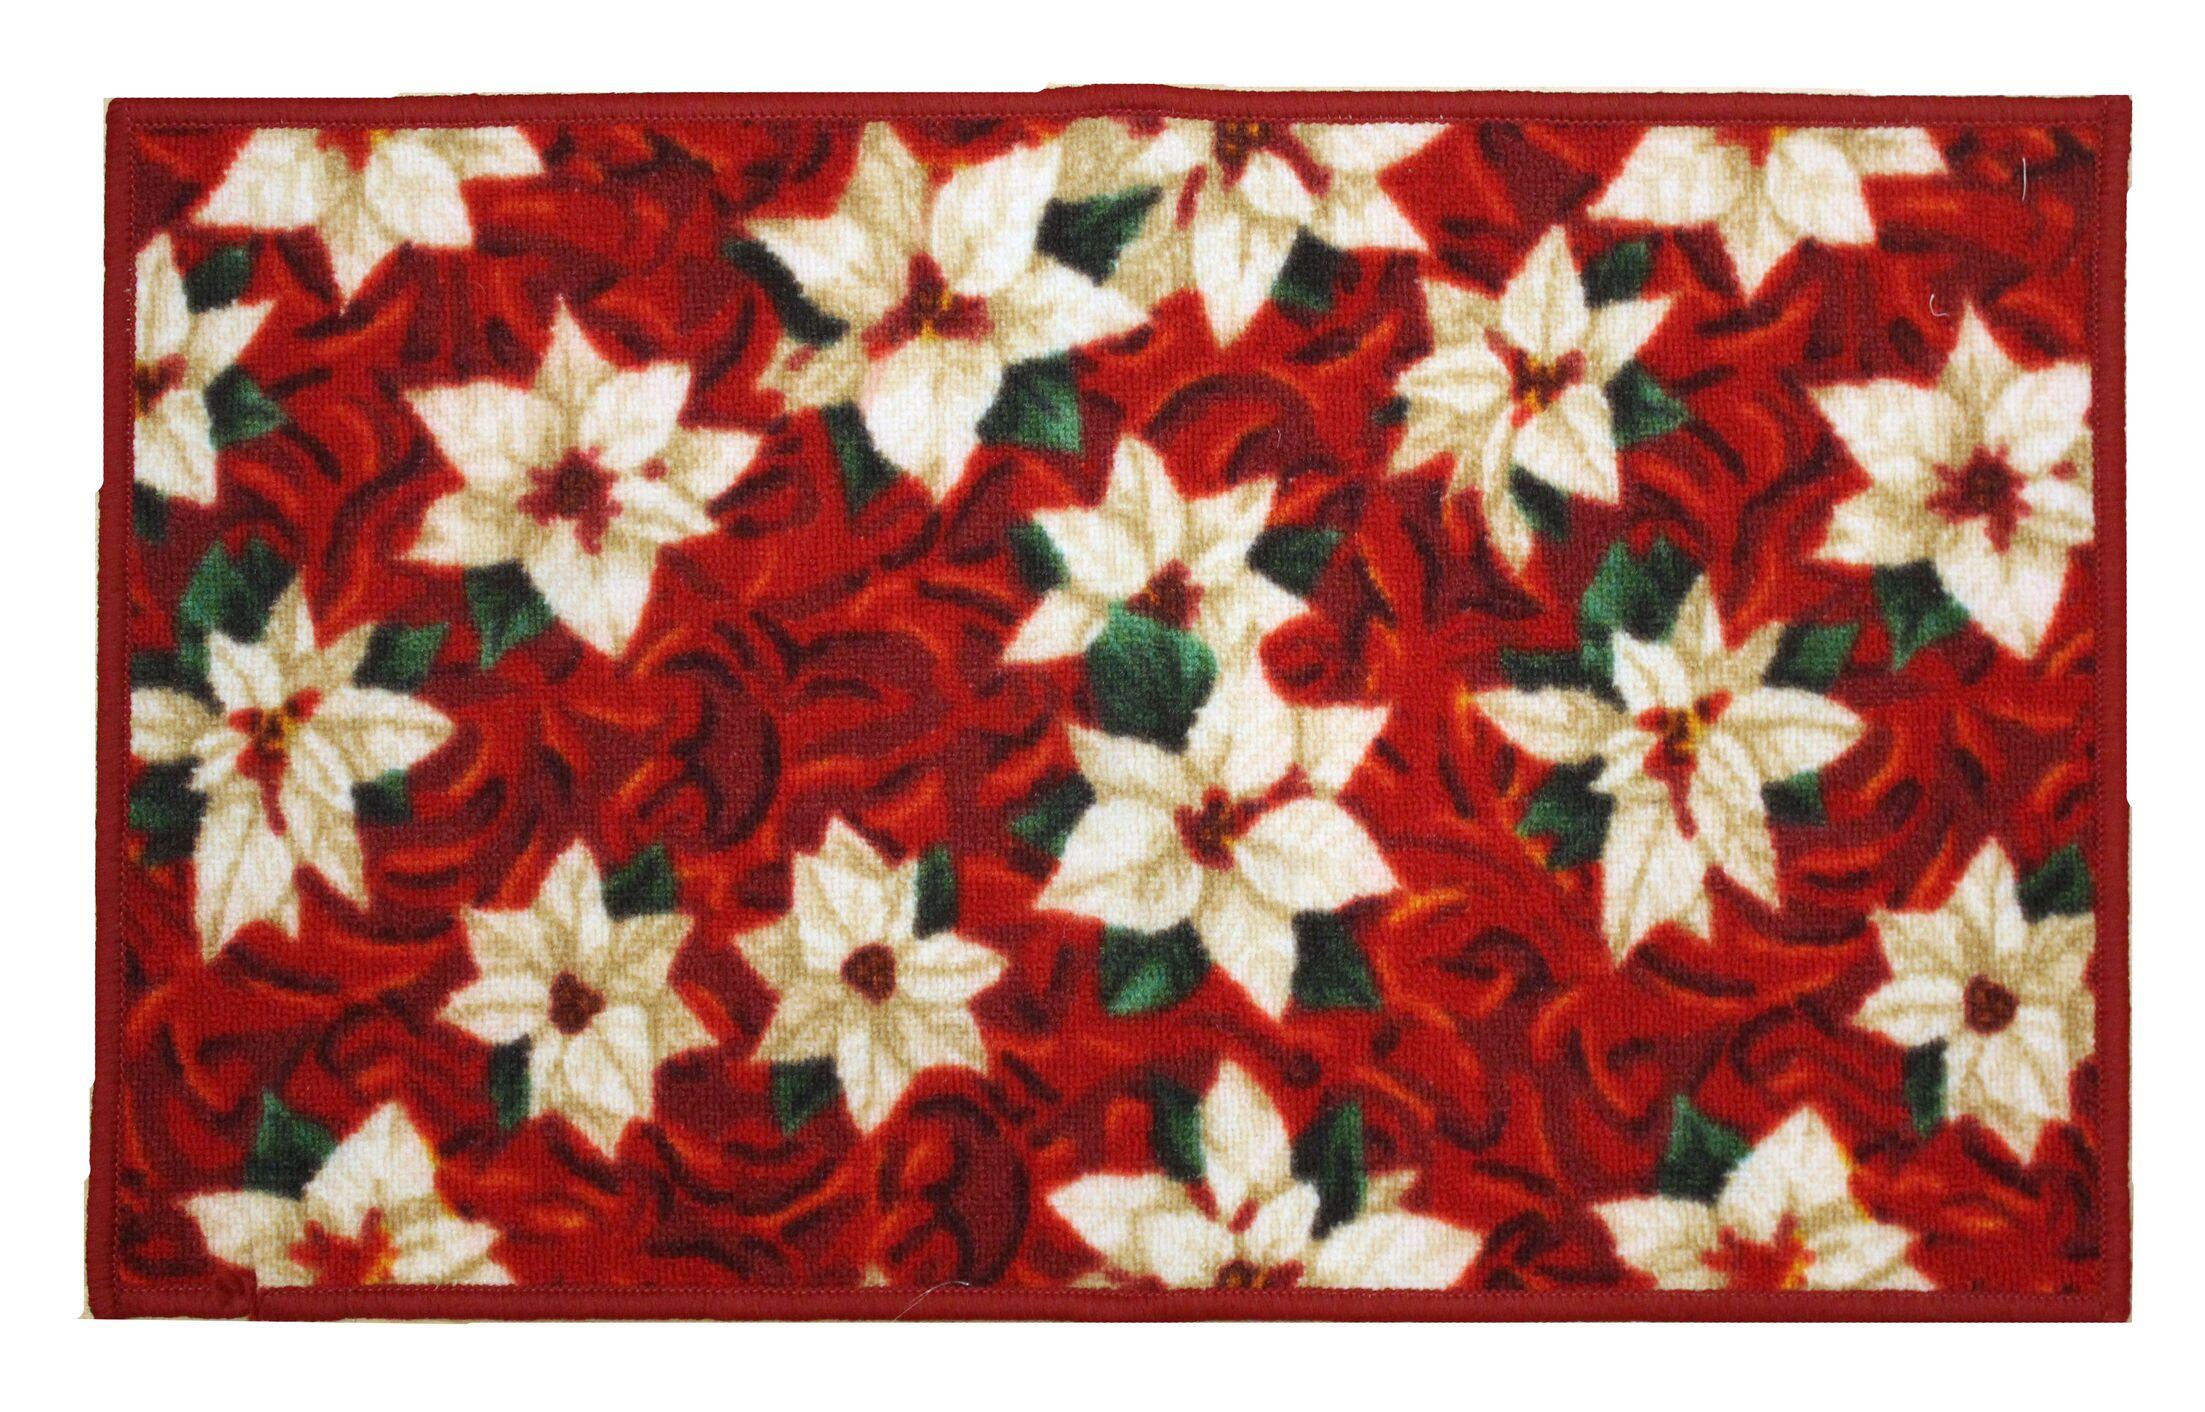 White Poinsettia Holiday Area Rug Rug Size: Rectangle 1'6